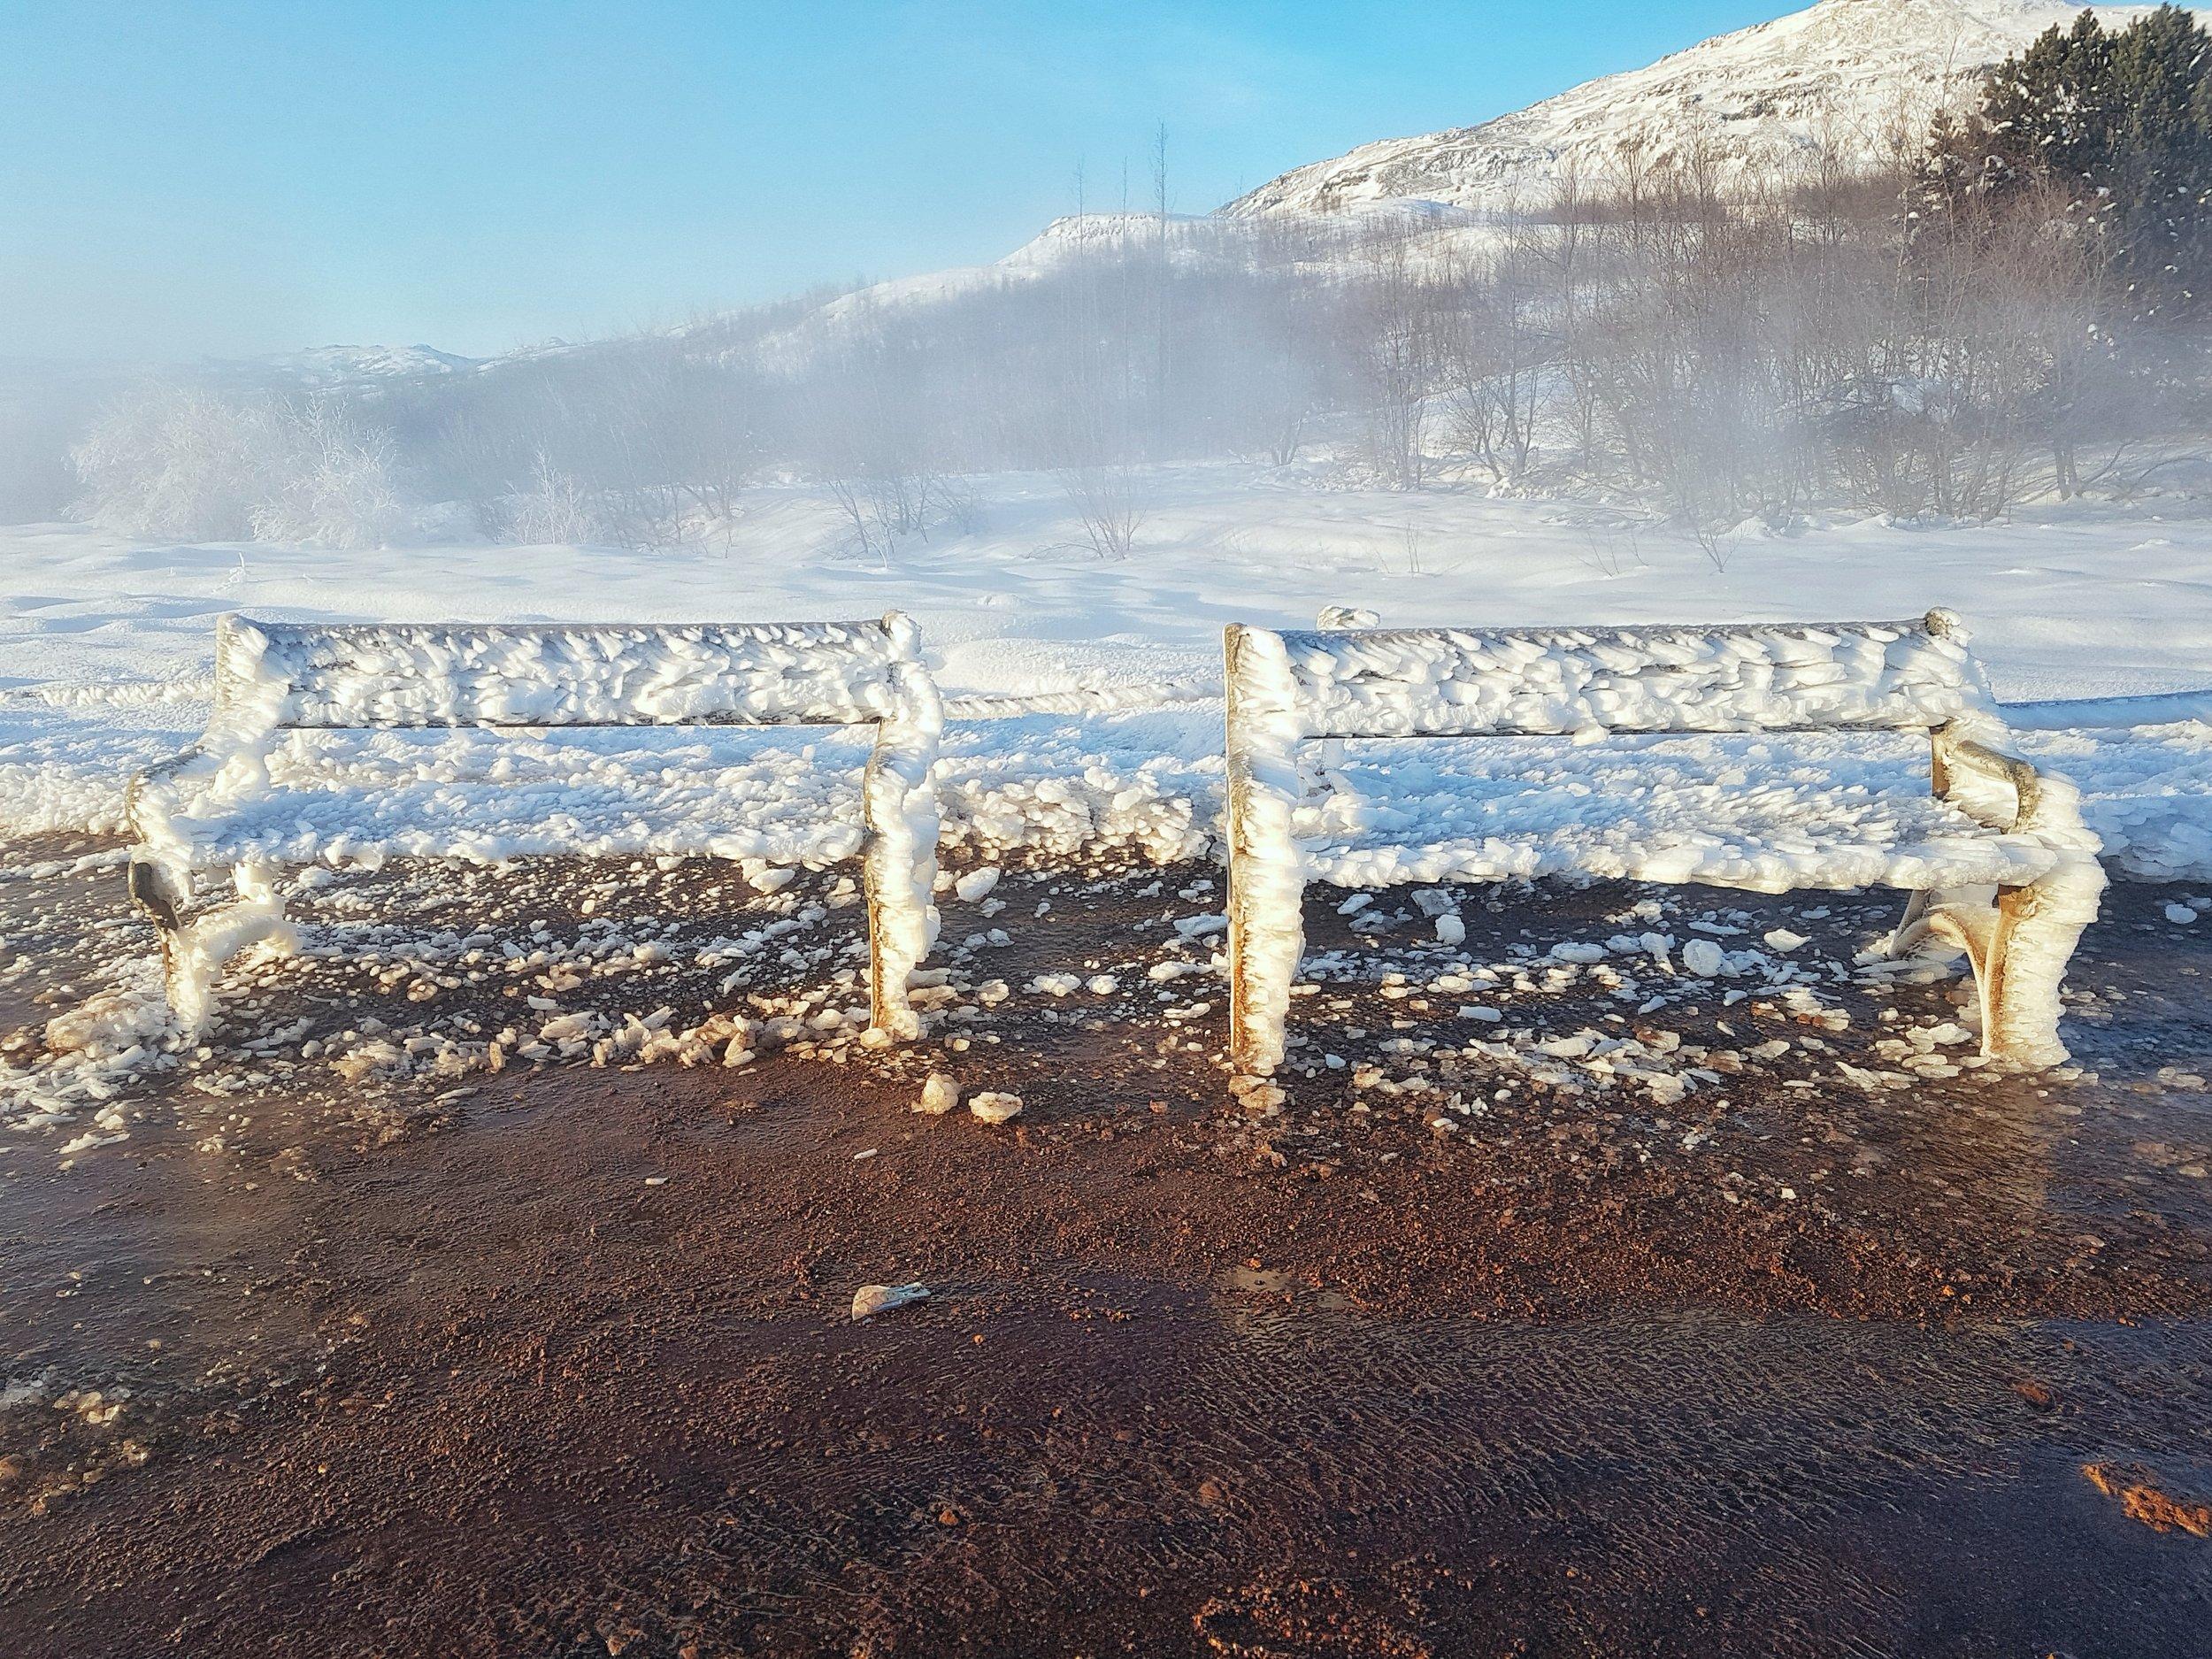 Iceland. snow. travel. adventure. photography. trip. epic landscape. snow. cold. freezing. sunrise. frozen chairs.jpg